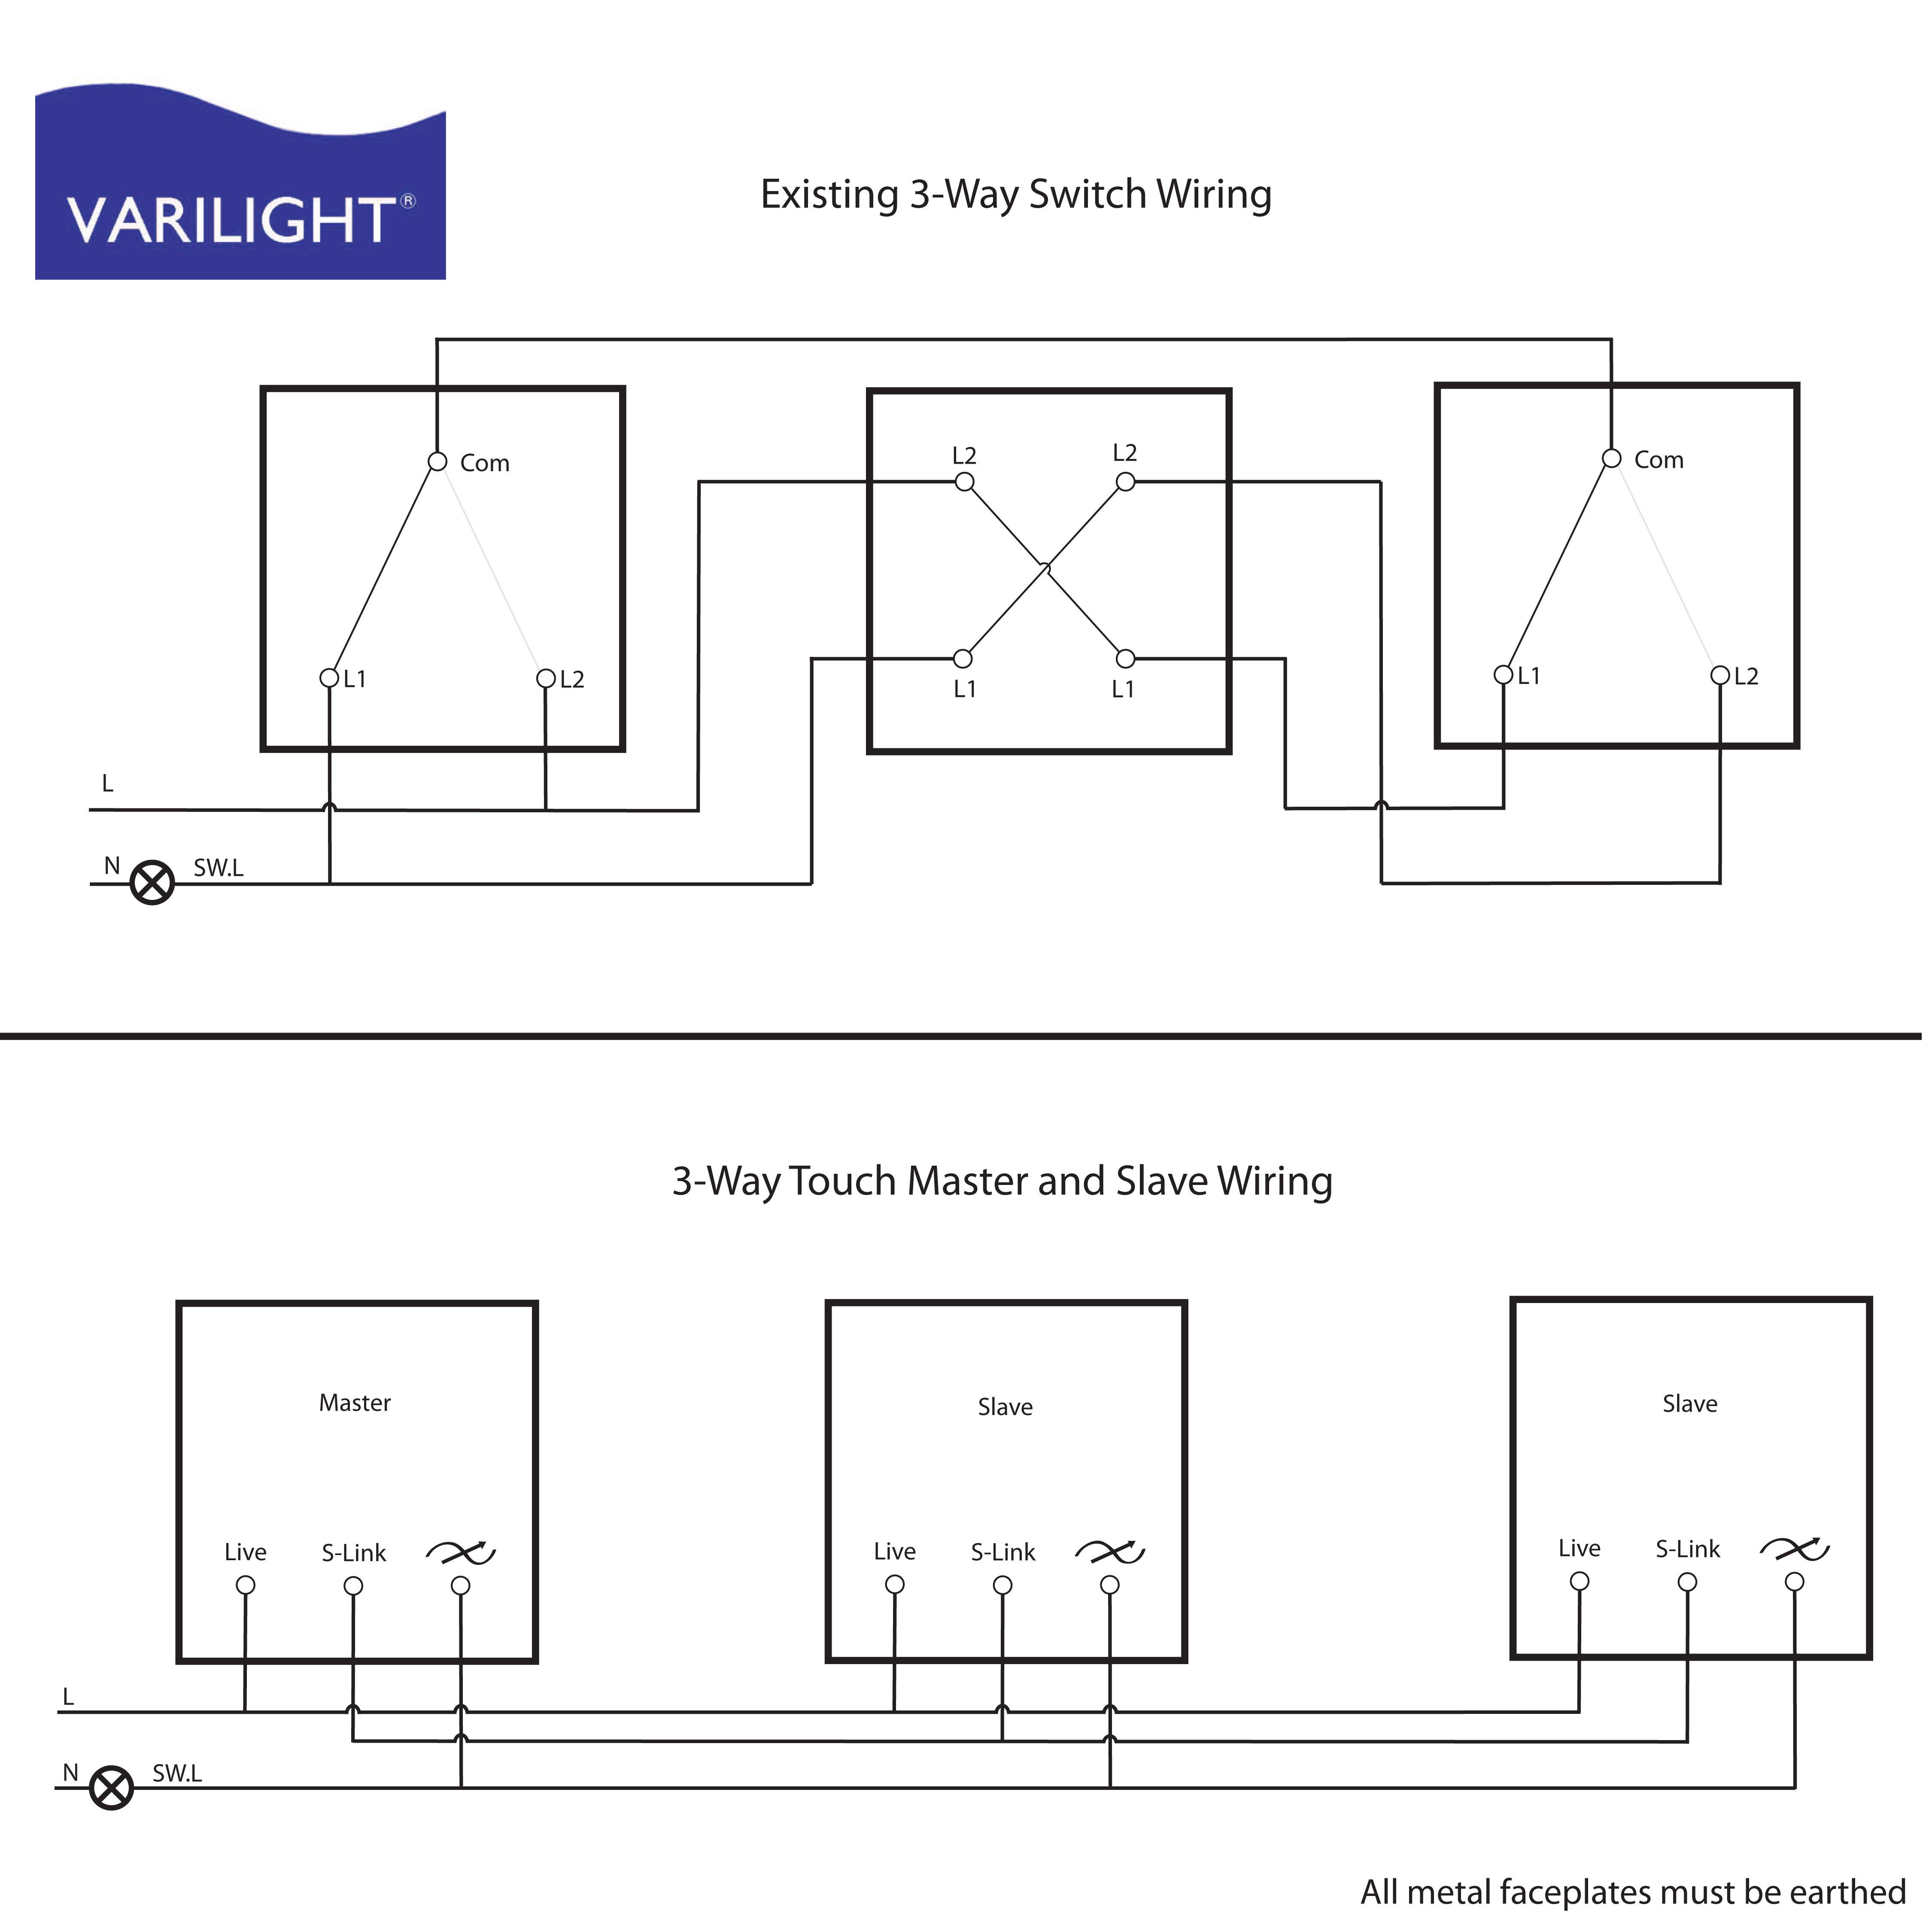 Varilight Wiring Diagrams - 3 Way Switch Wiring Diagram